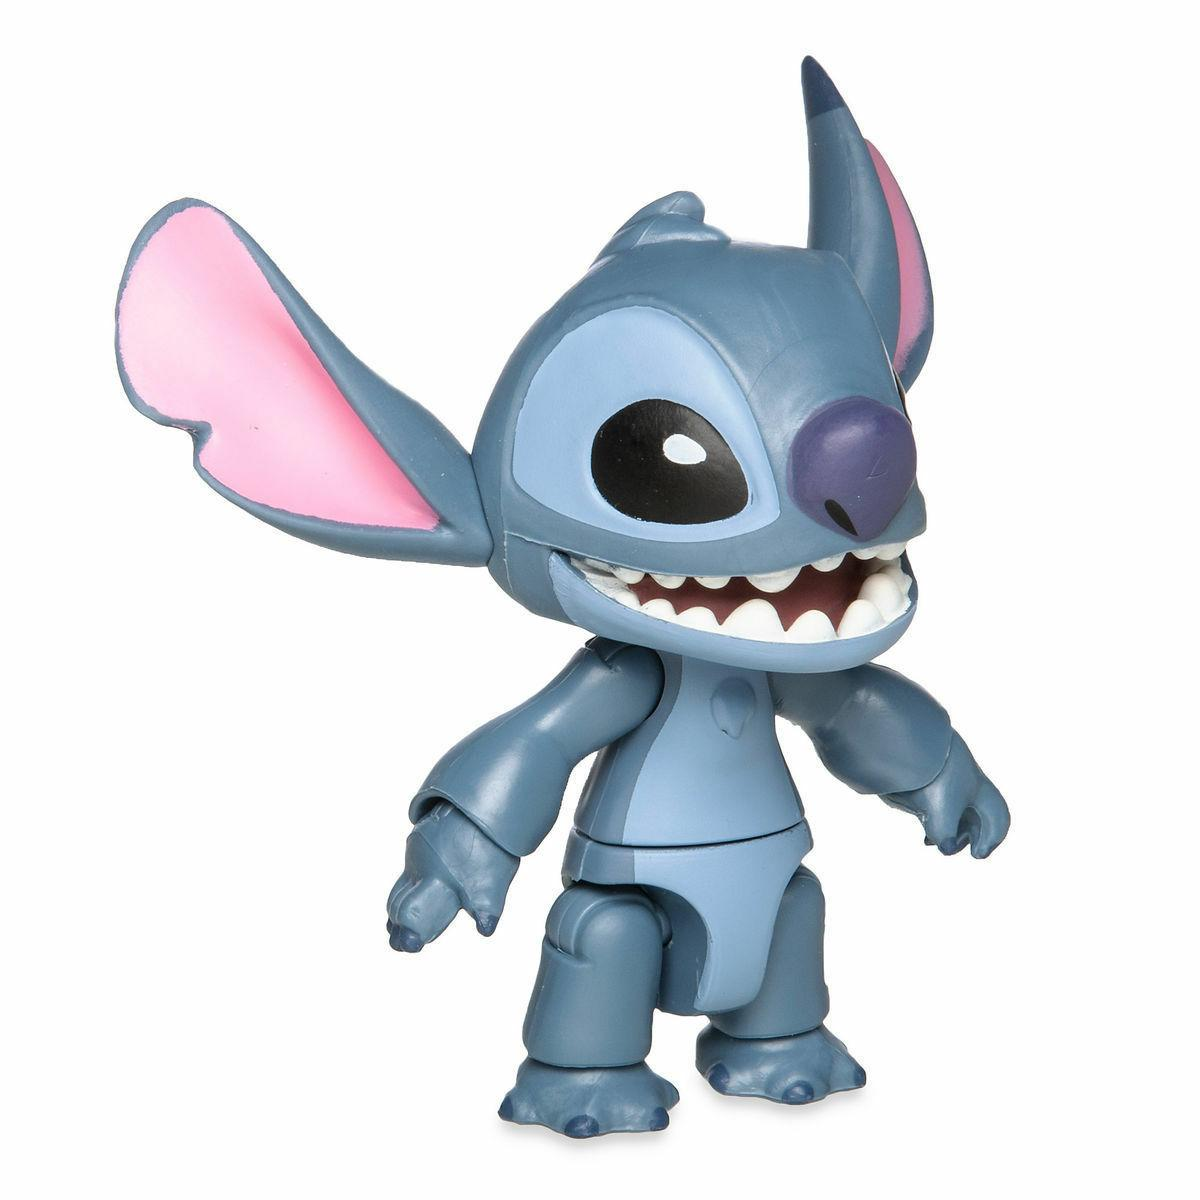 Disney stitch action figure toybox new rare